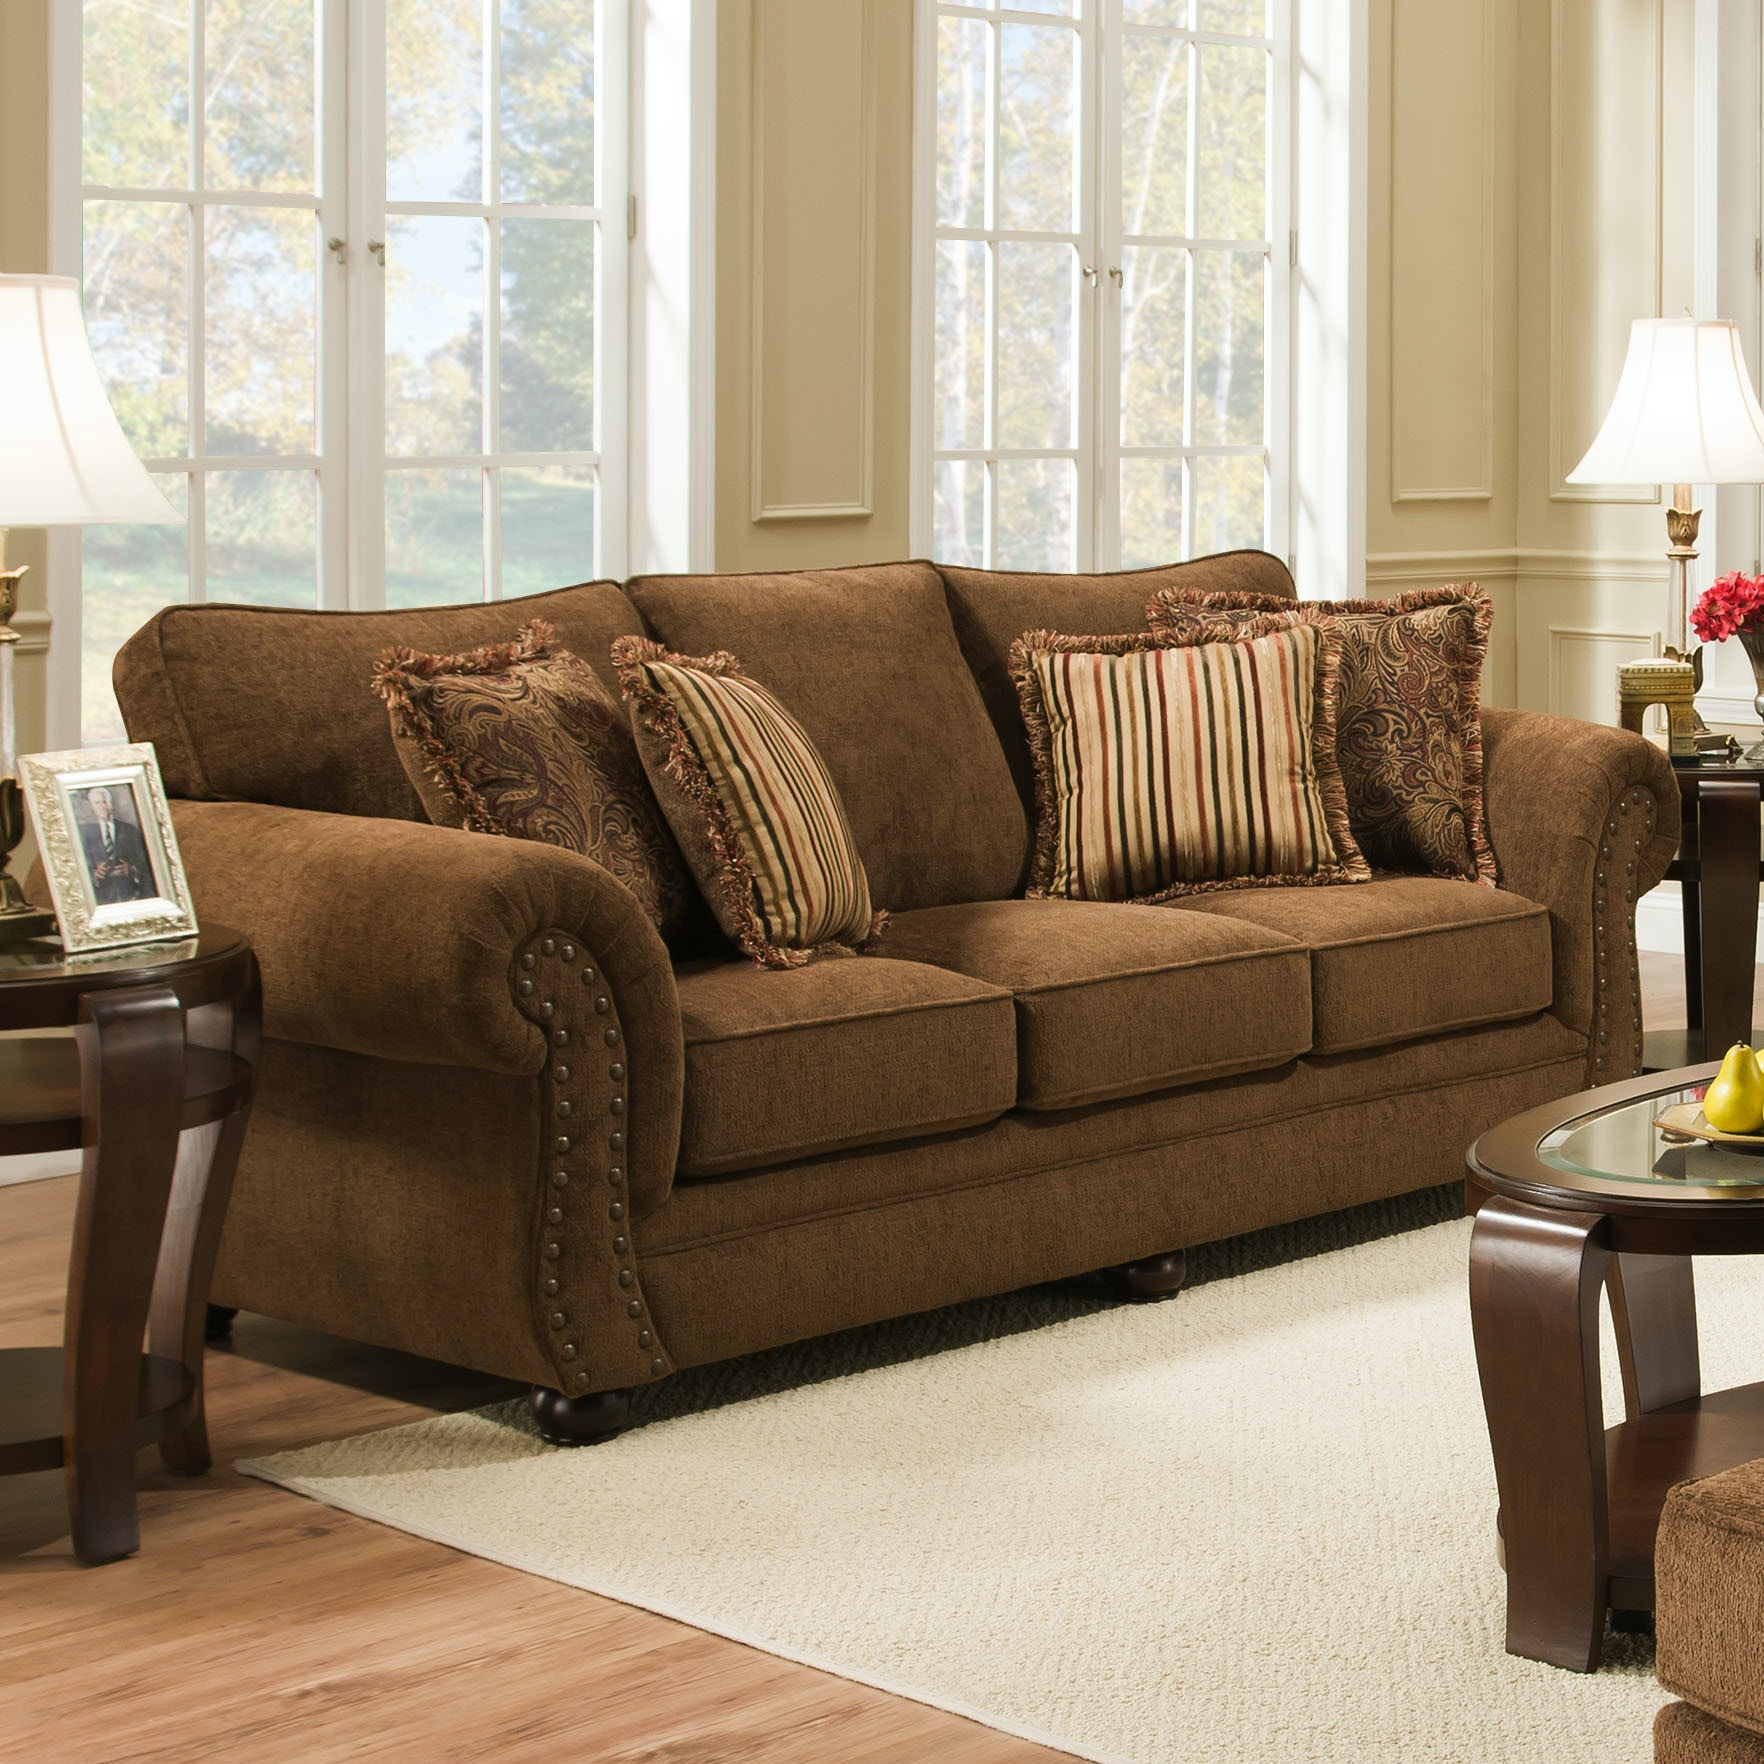 Simmons Upholstery Living Room Outback Chocolate Sofa